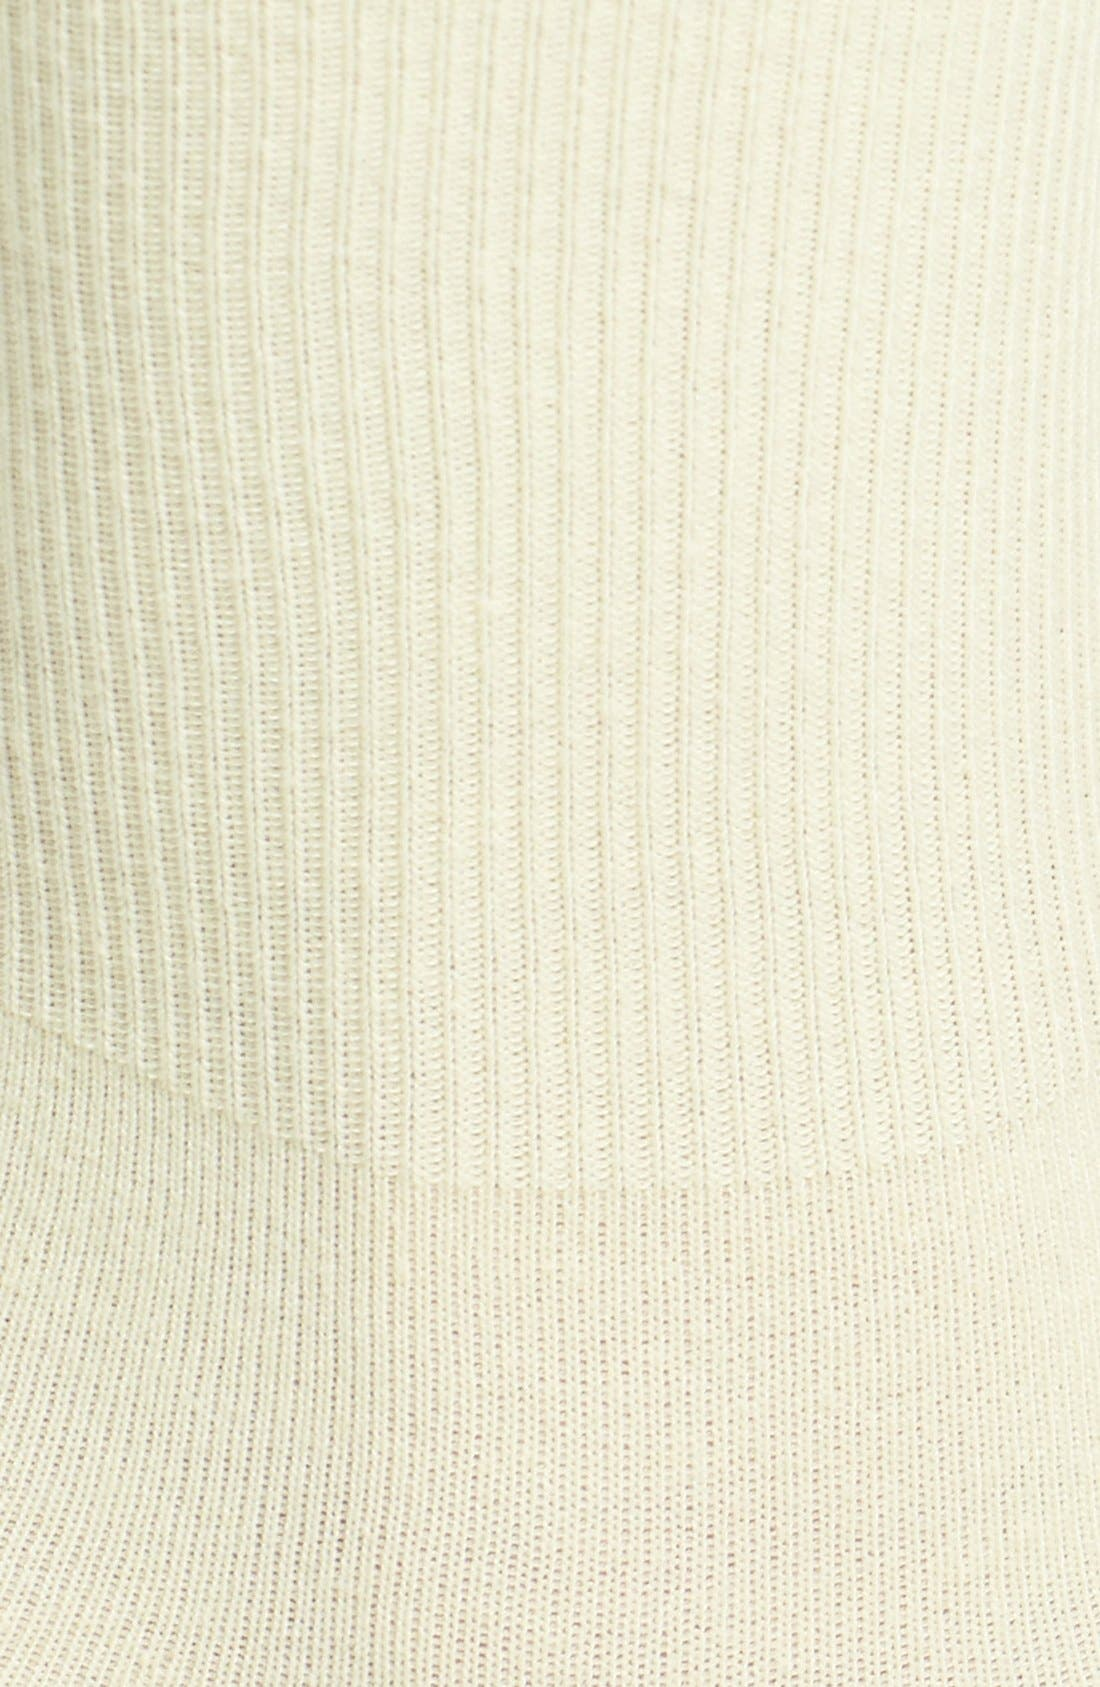 Alternate Image 2  - Hue Turncuff Socks (3 for $18)